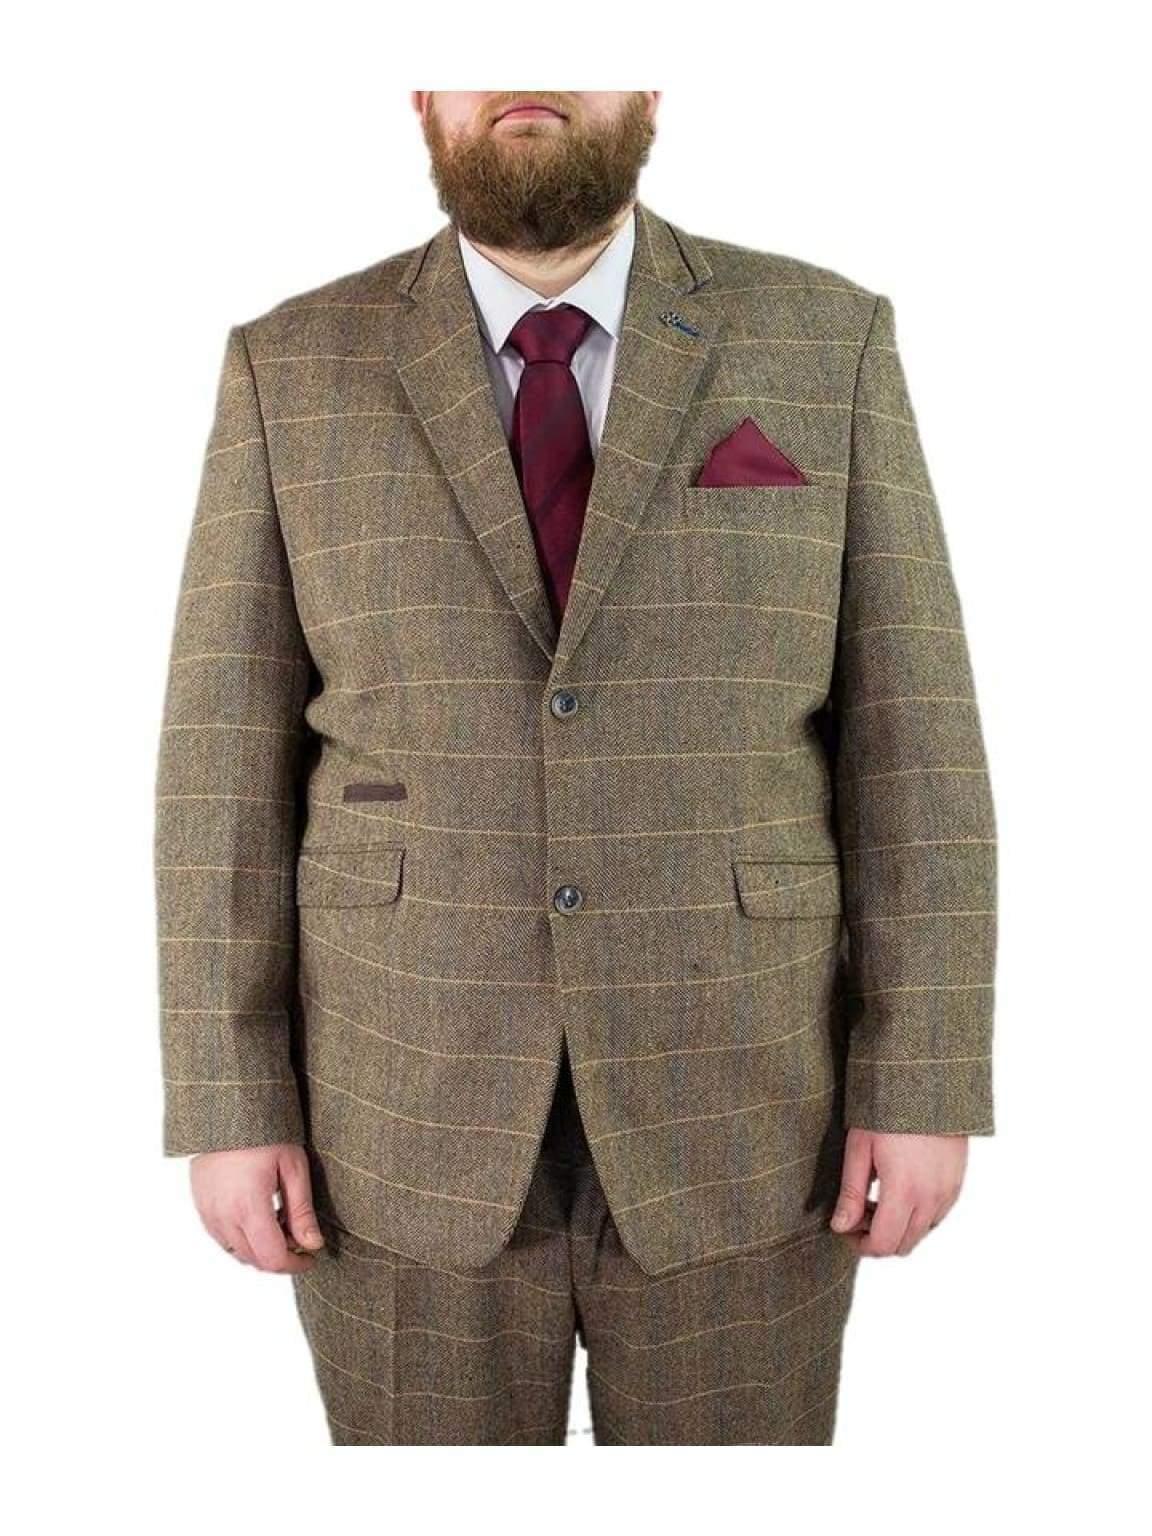 Big & Tall Tweed Suit Regular Fit Cavani Albert Beige Tan Brown Mens 2 Piece Suit - 48S / 44S - Suit & Tailoring